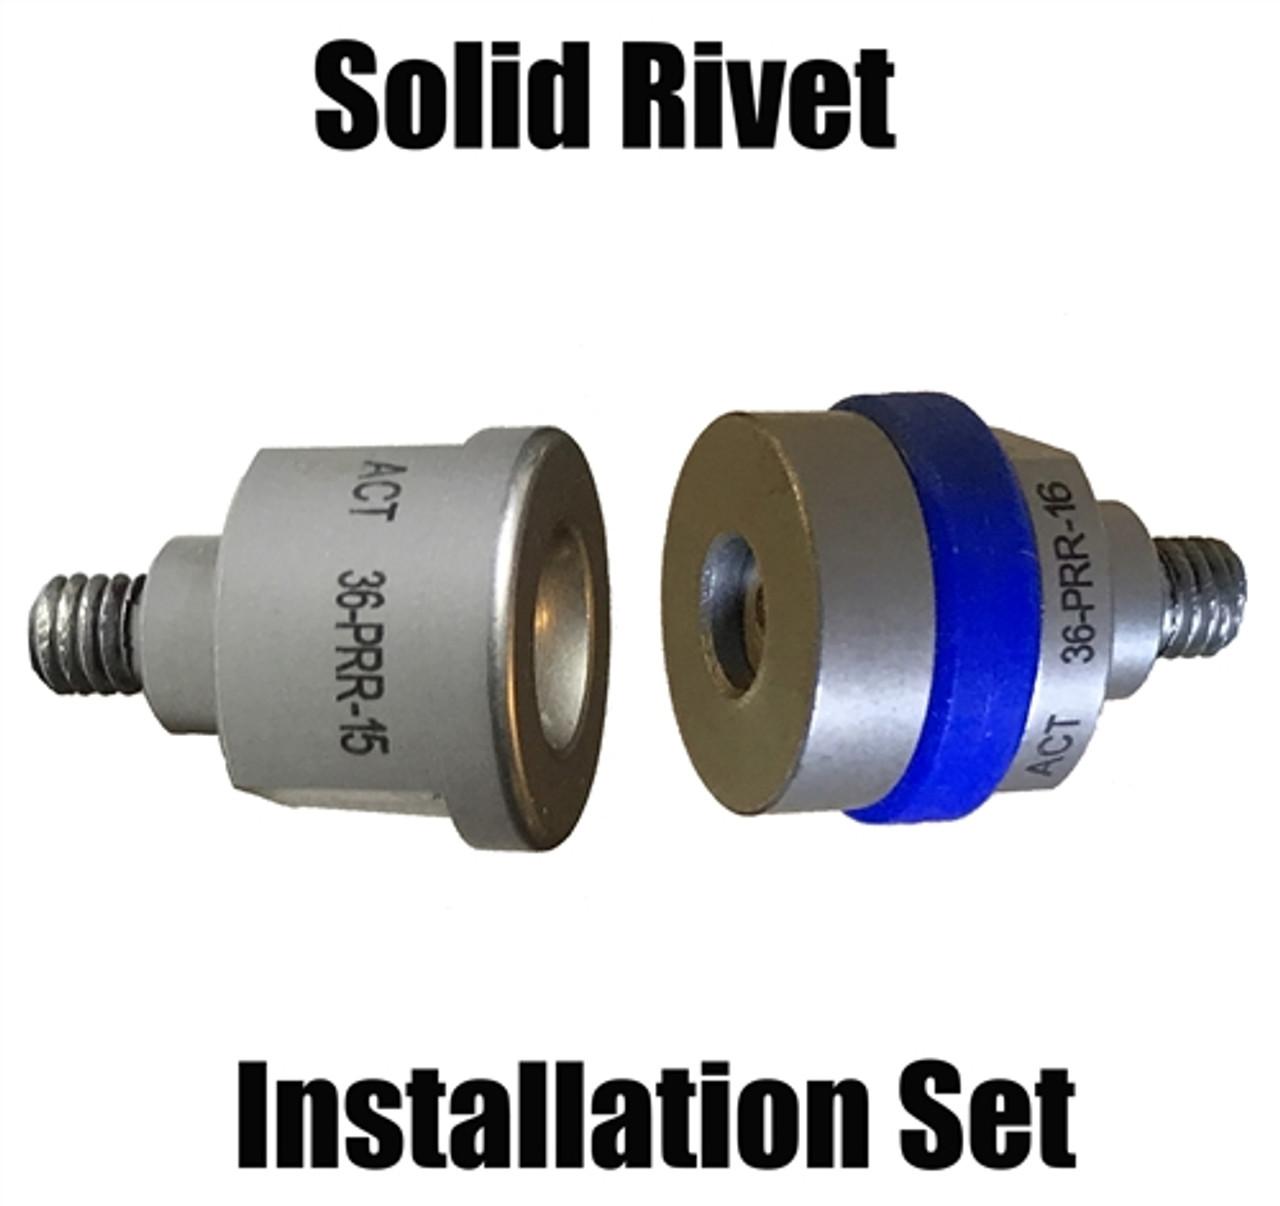 SPR-12 Aluminum Self Piercing rivet 3mm punch  and Forming die Set